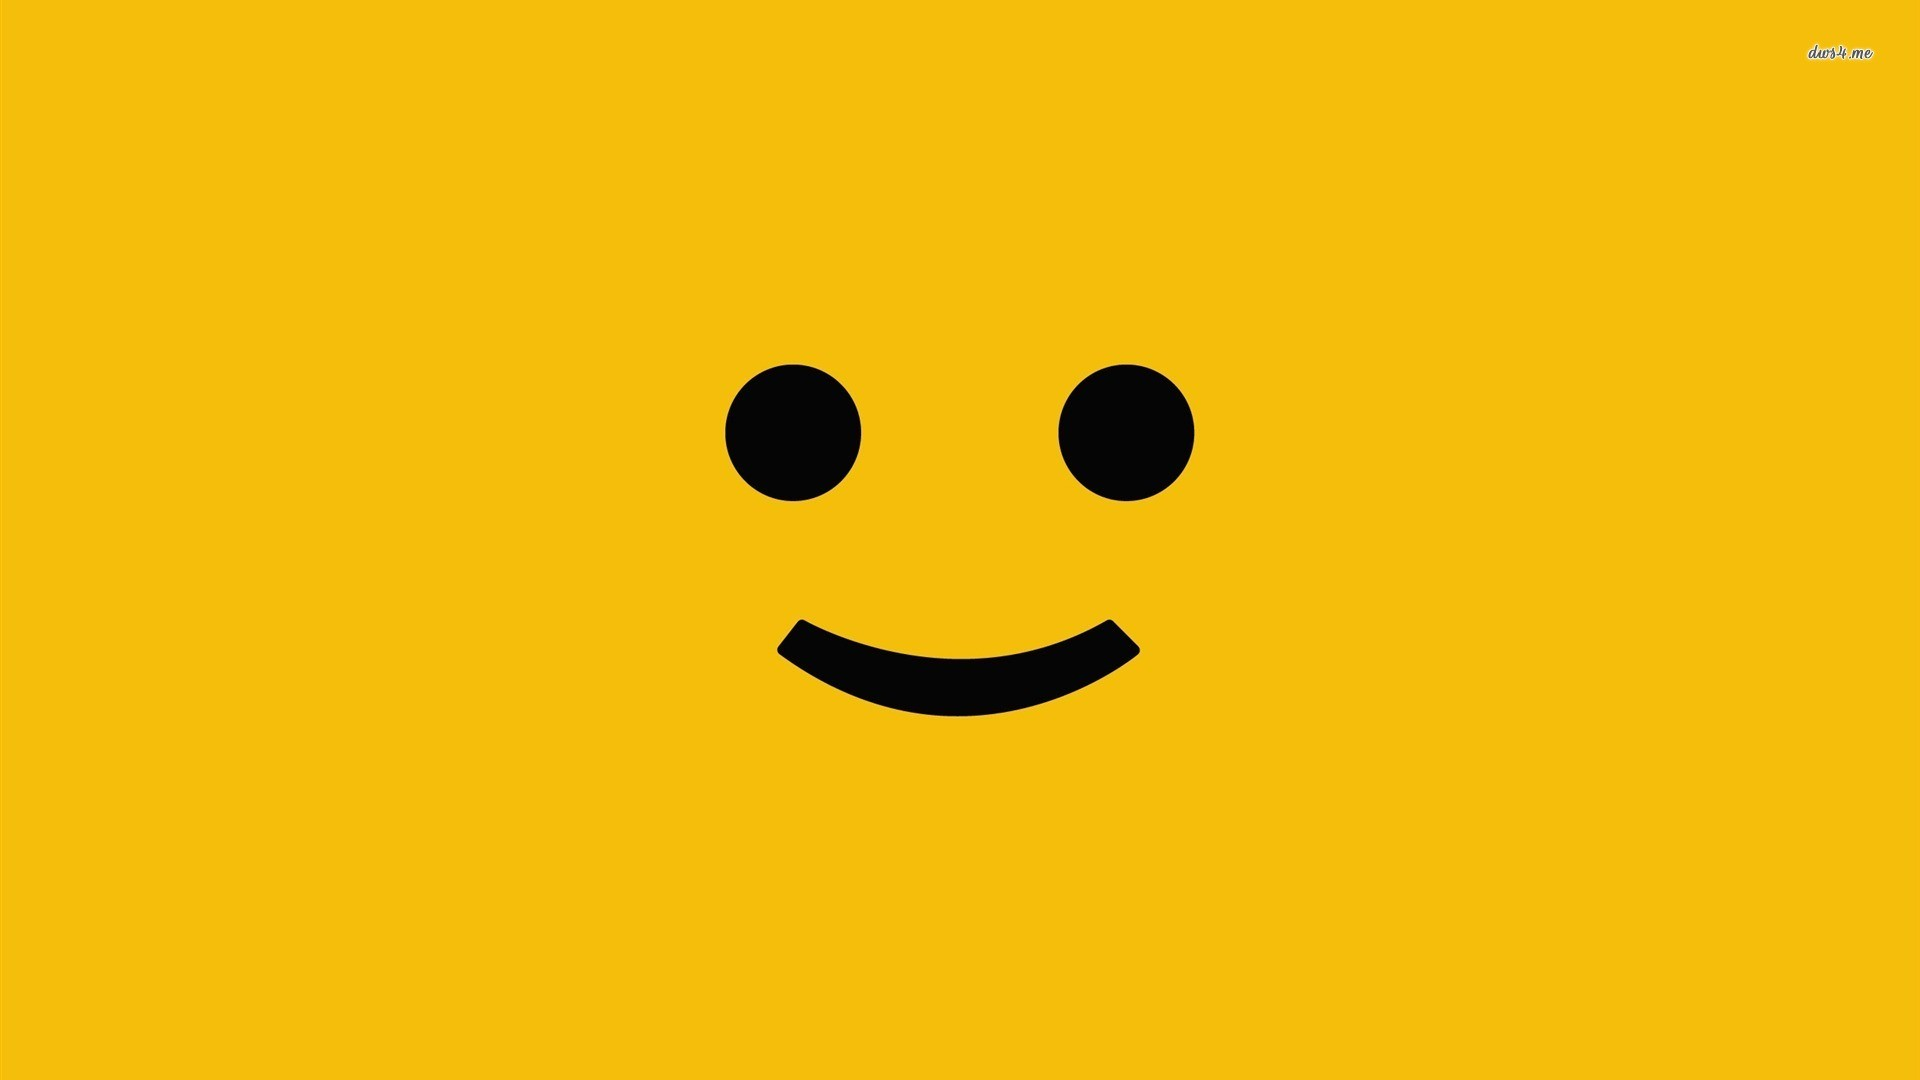 Smile Wallpaper Images